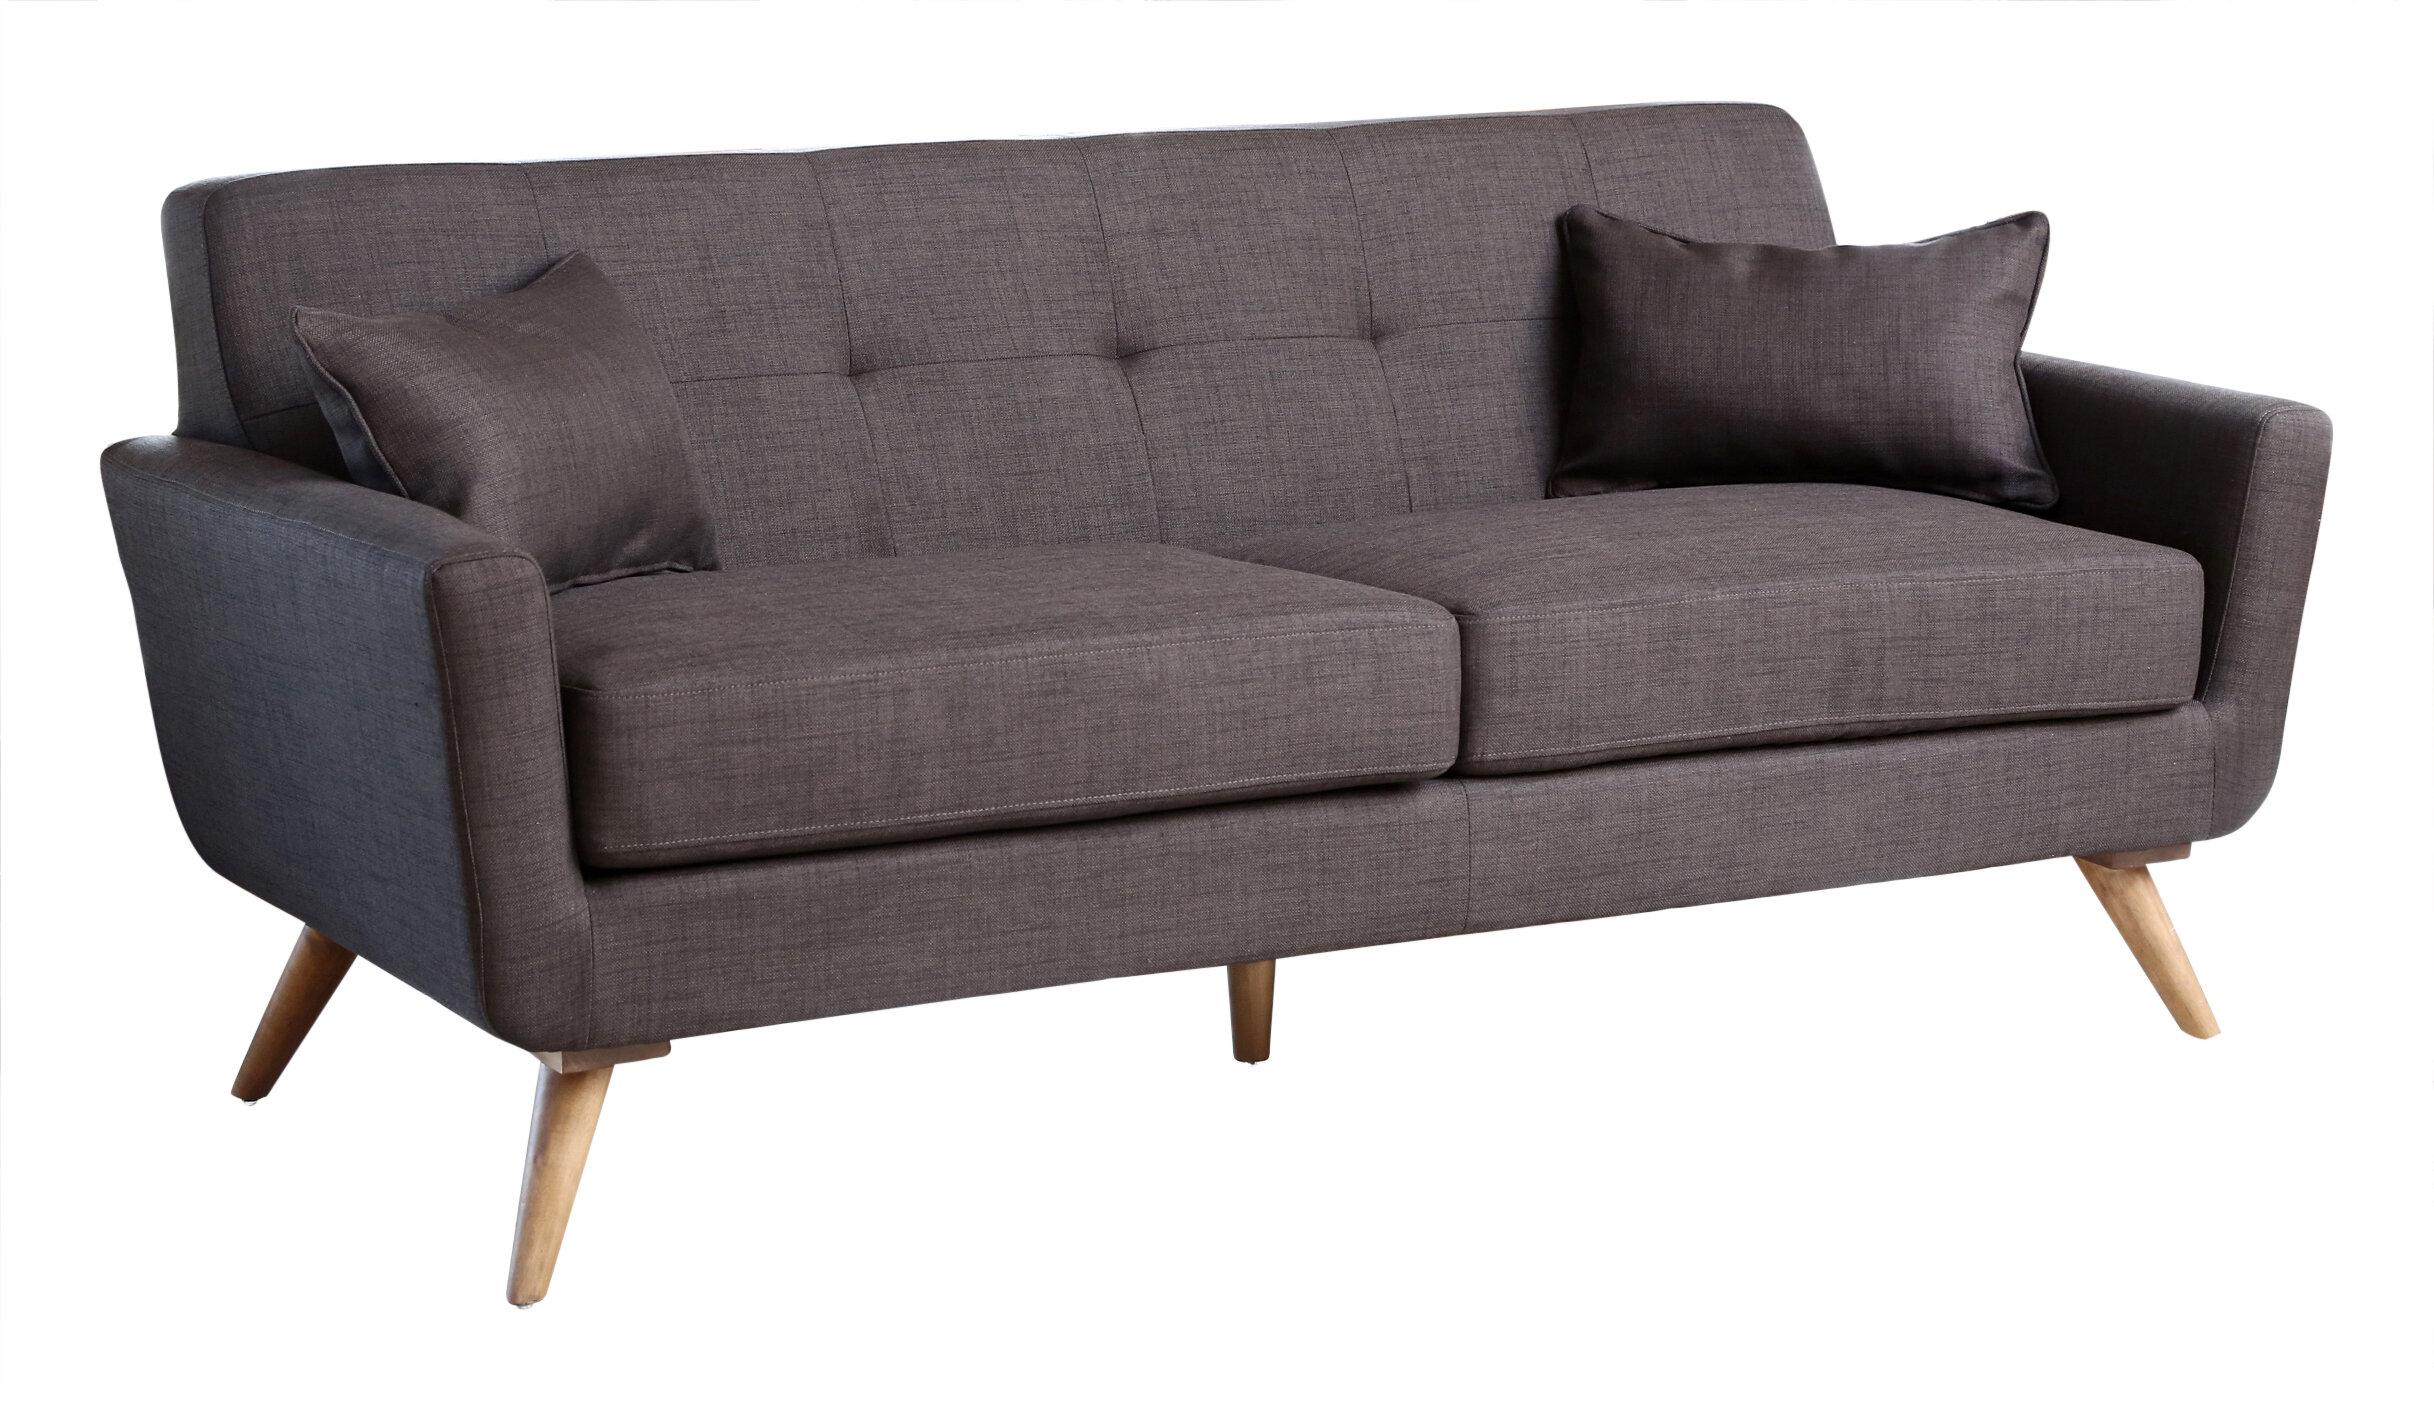 Perfect Langley Street Fresco Tufted Sofa U0026 Reviews | Wayfair